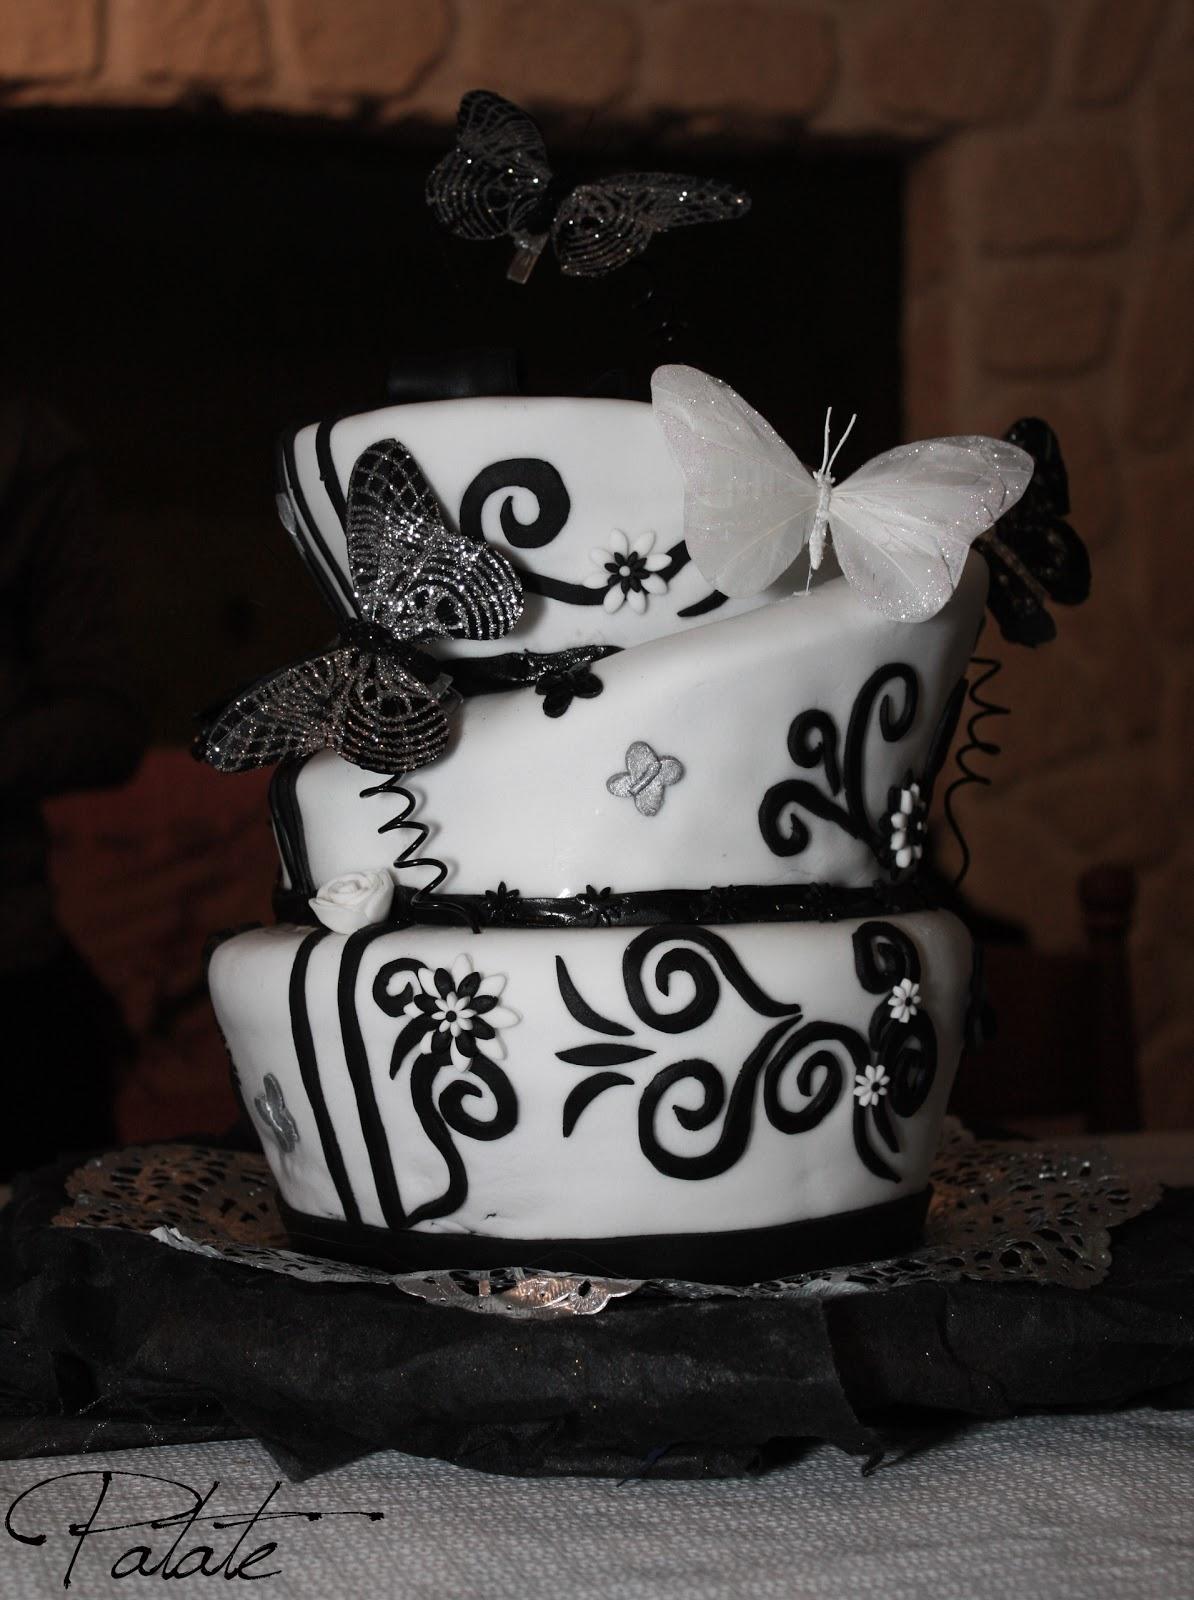 g teau de mariage noir et blanc cr ations cake design par olivia resch. Black Bedroom Furniture Sets. Home Design Ideas